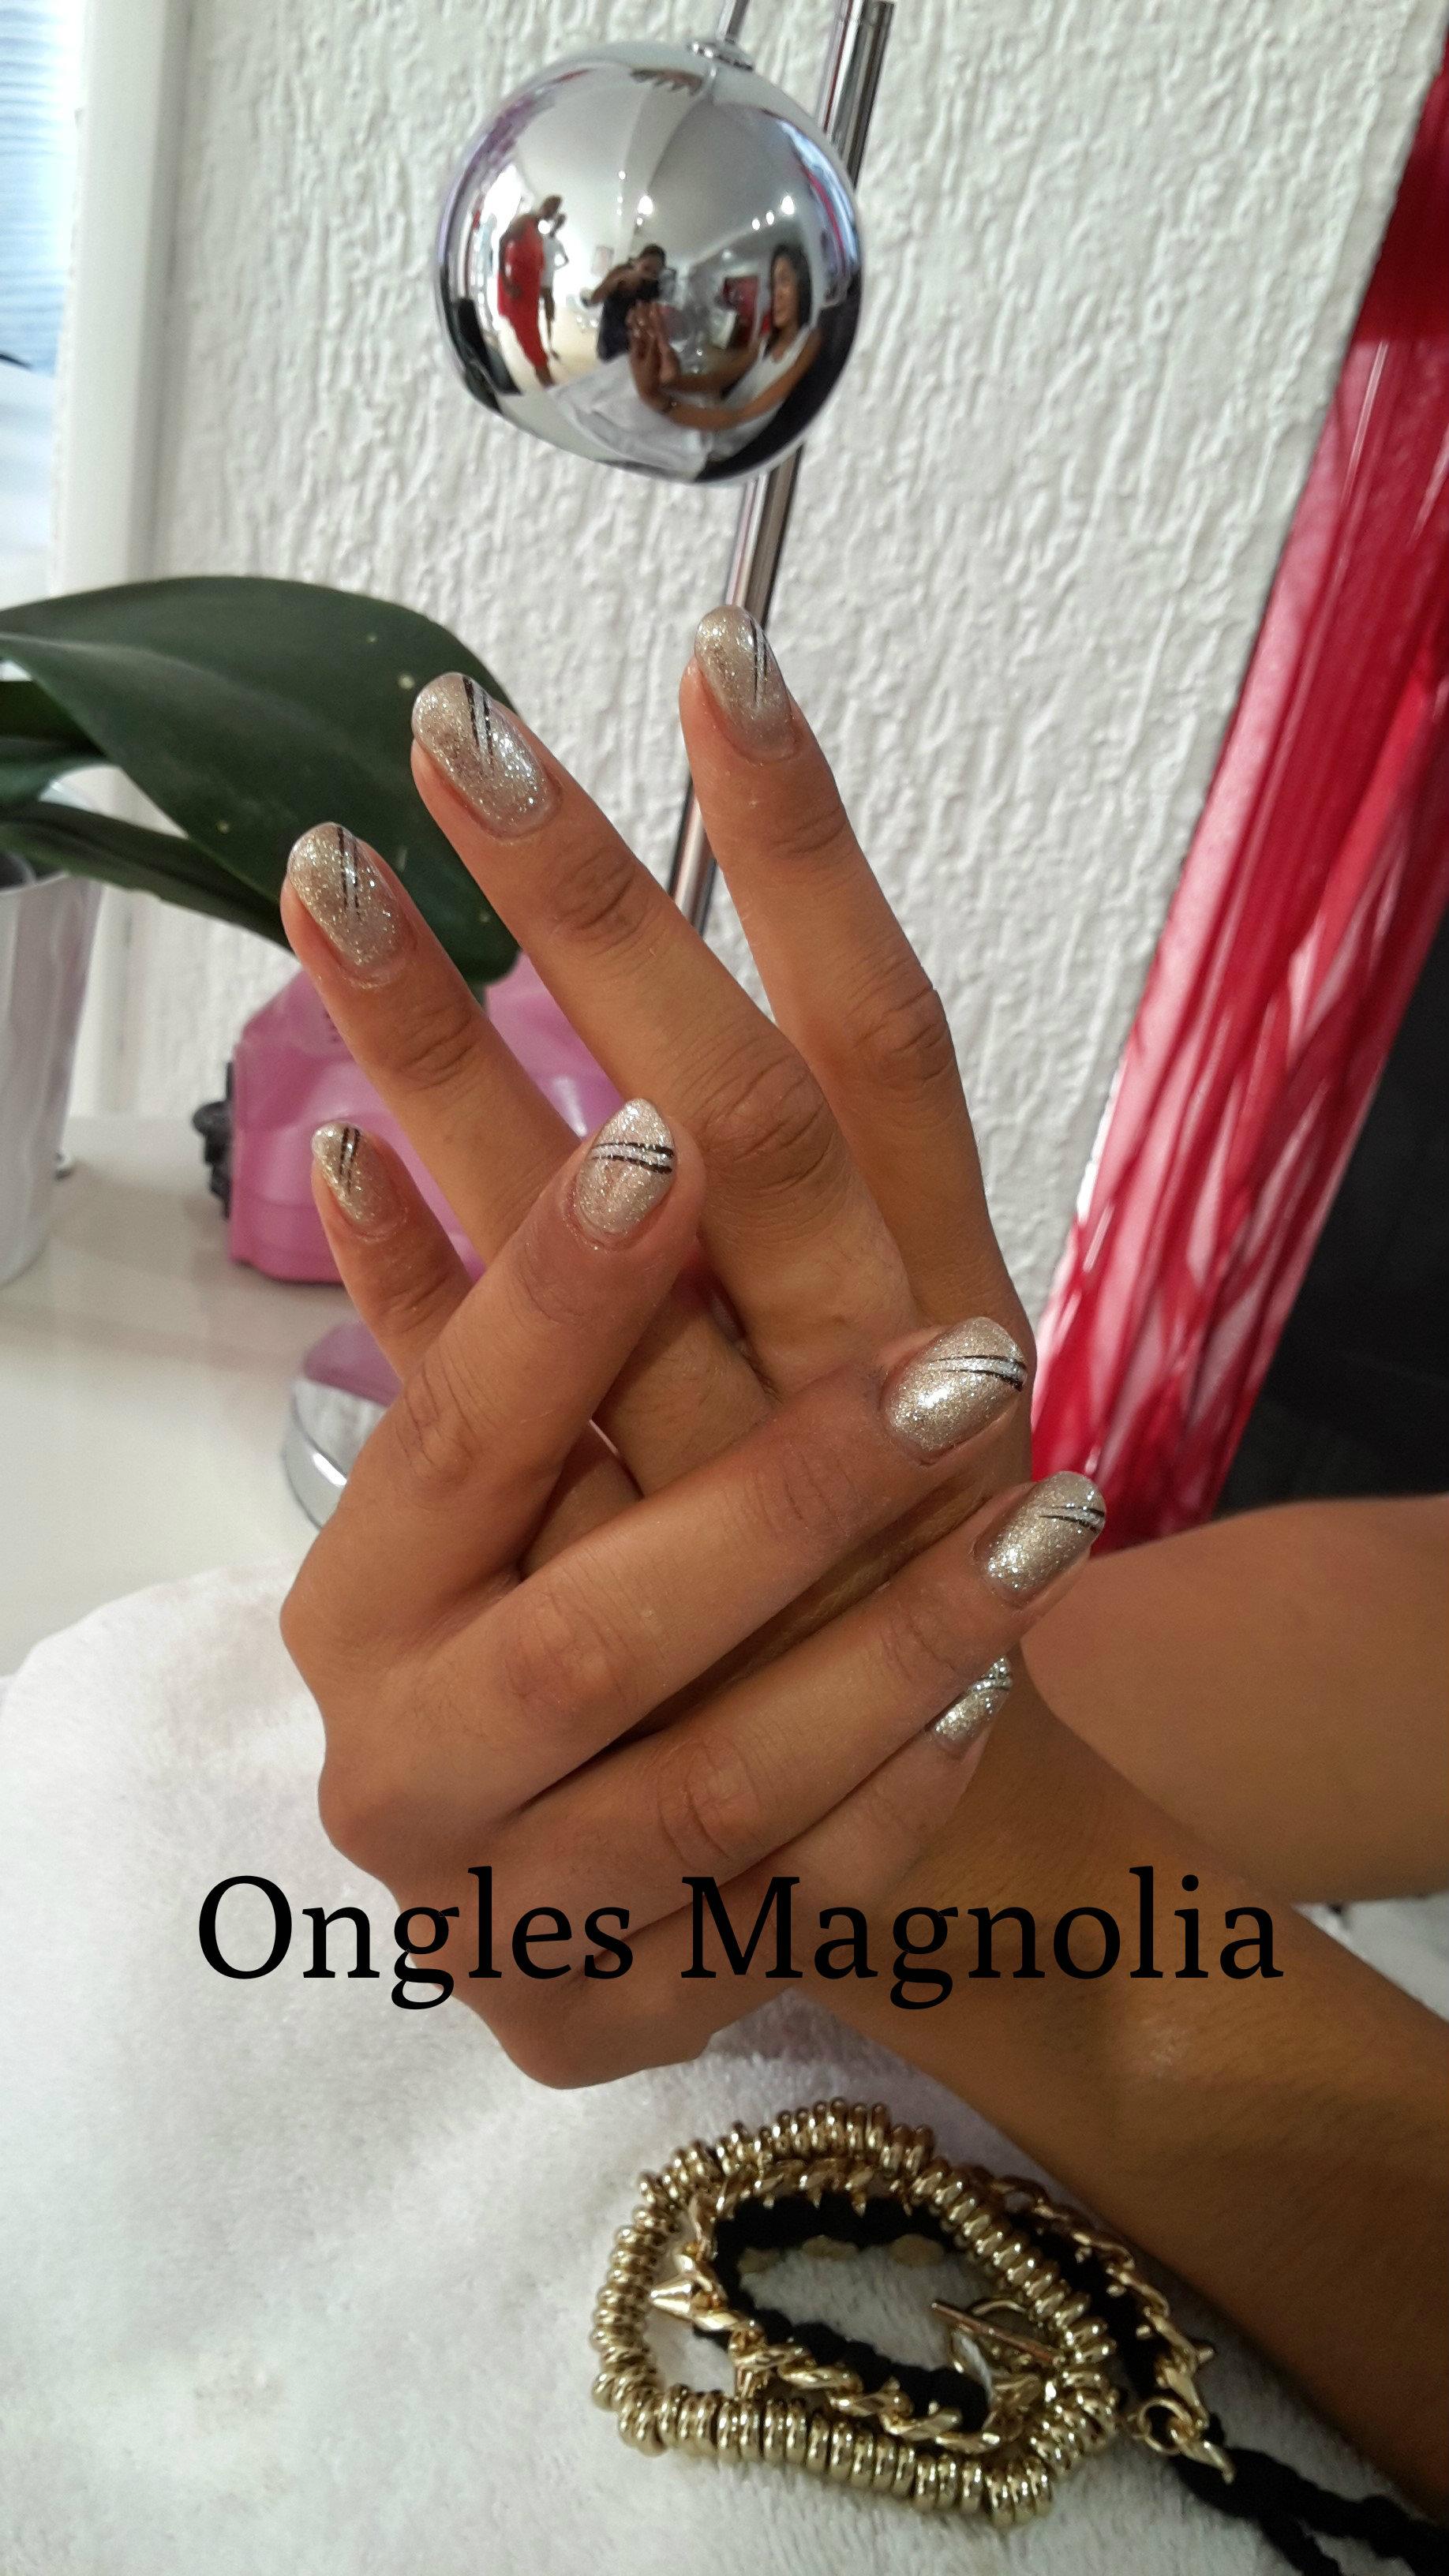 Ongles Magnolia pose d'ongles en gel neuville sur saone lyon